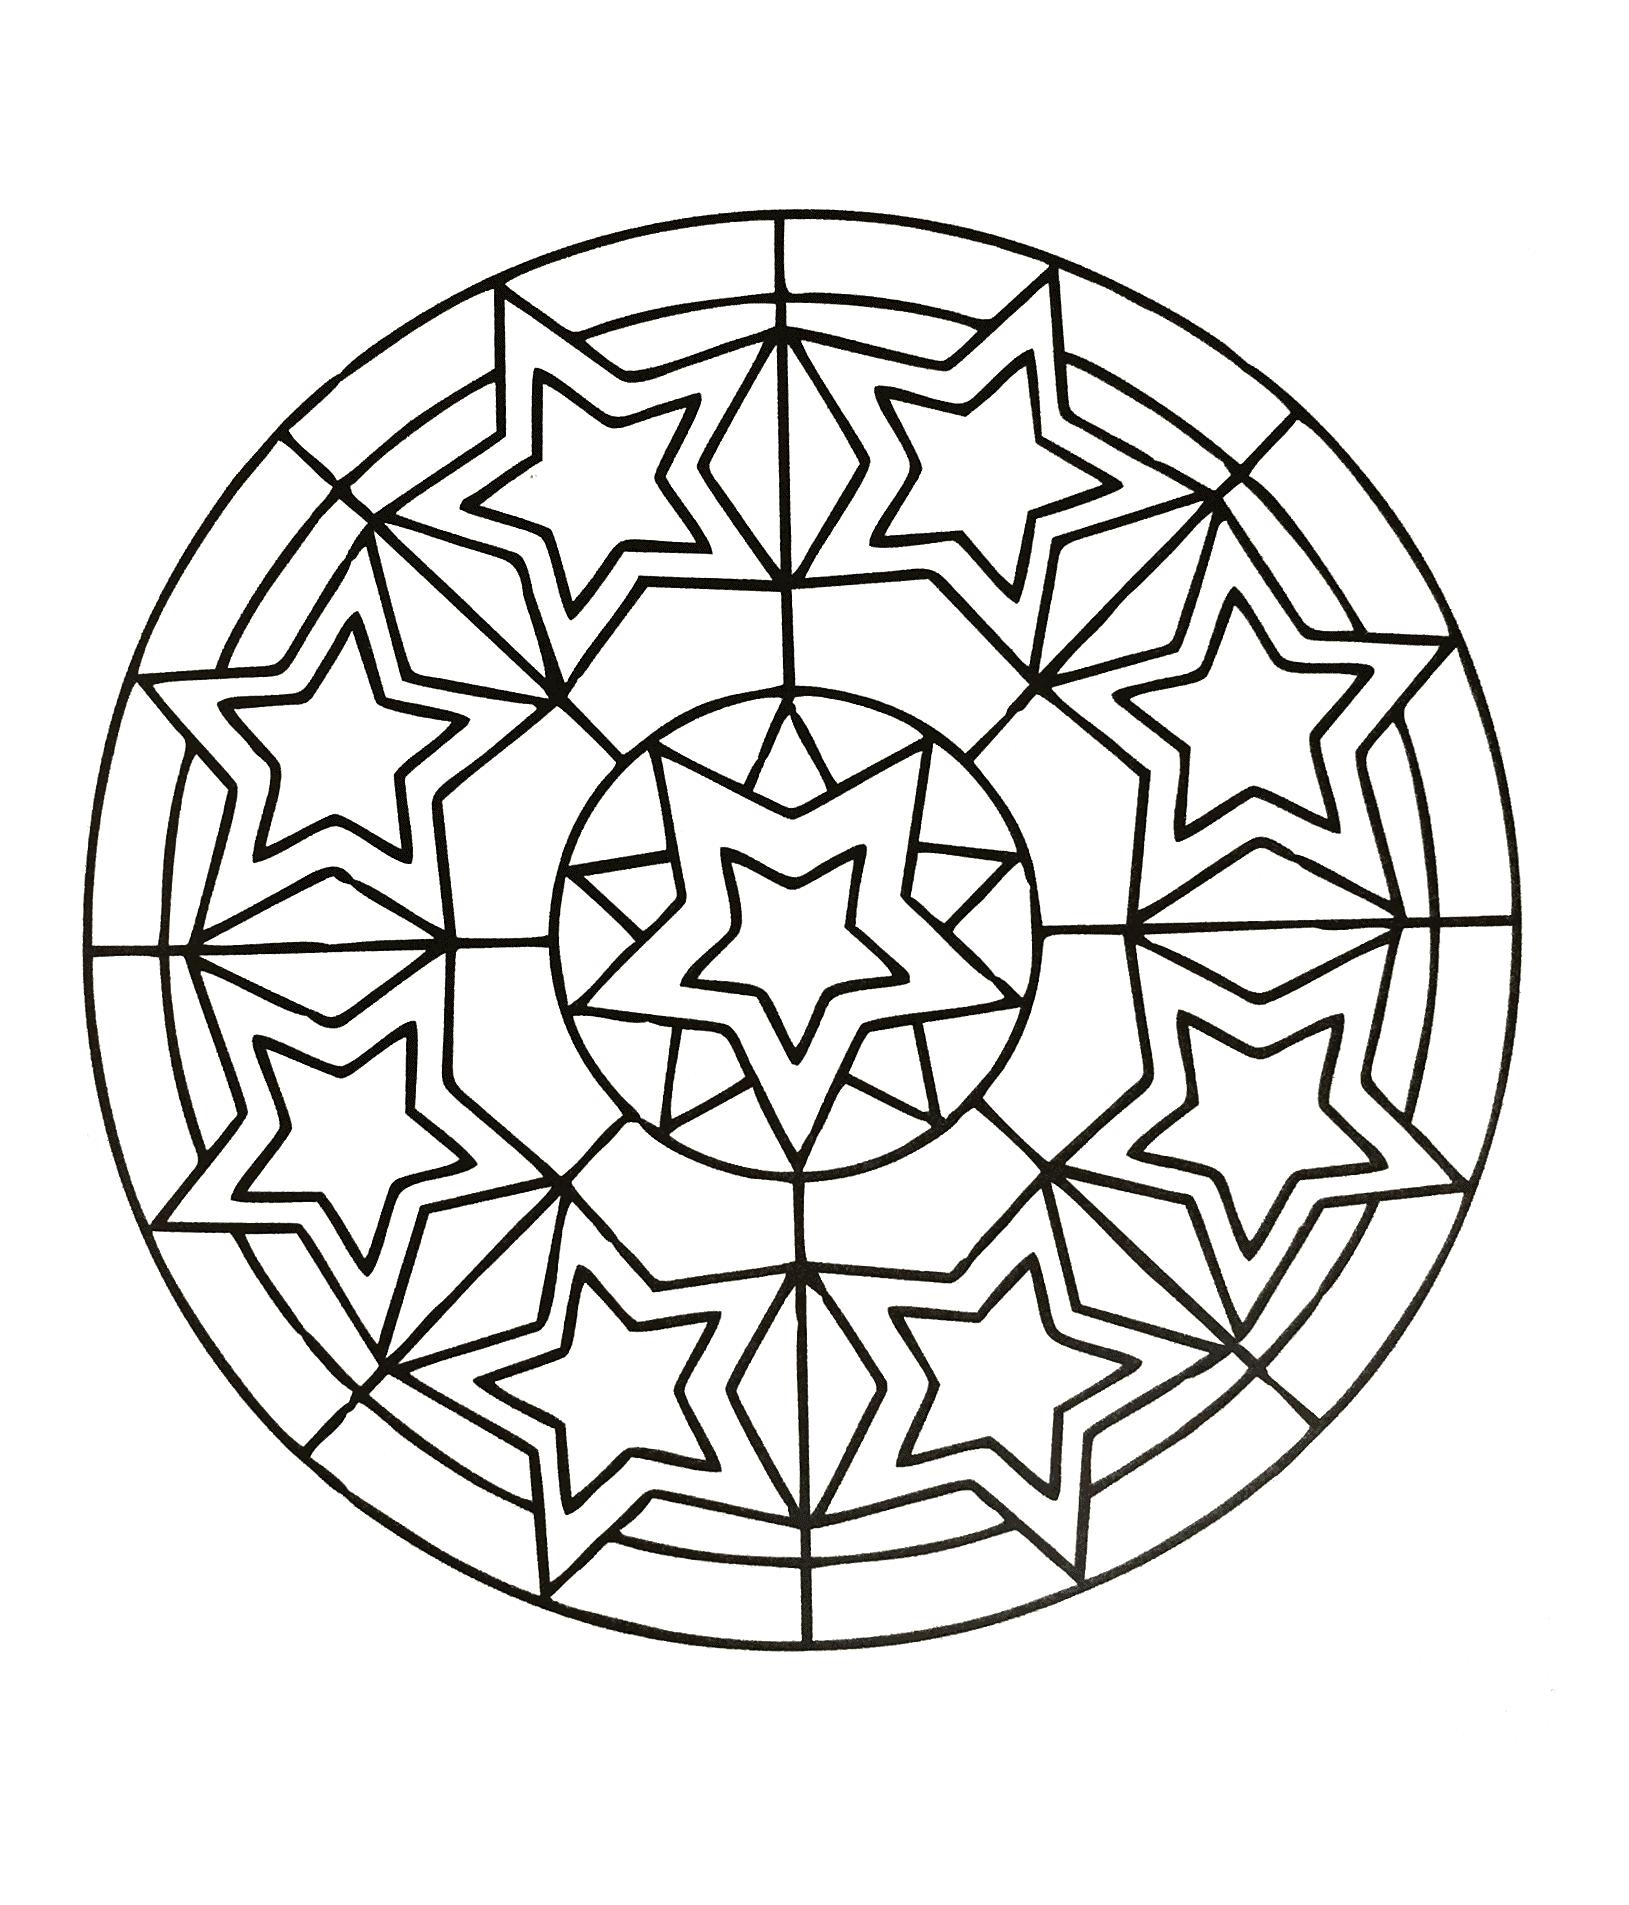 Mandalas A Imprimer Gratuit 49 Mandalas Avec Motifs Geometriques 100 Mandalas Zen Anti Stress